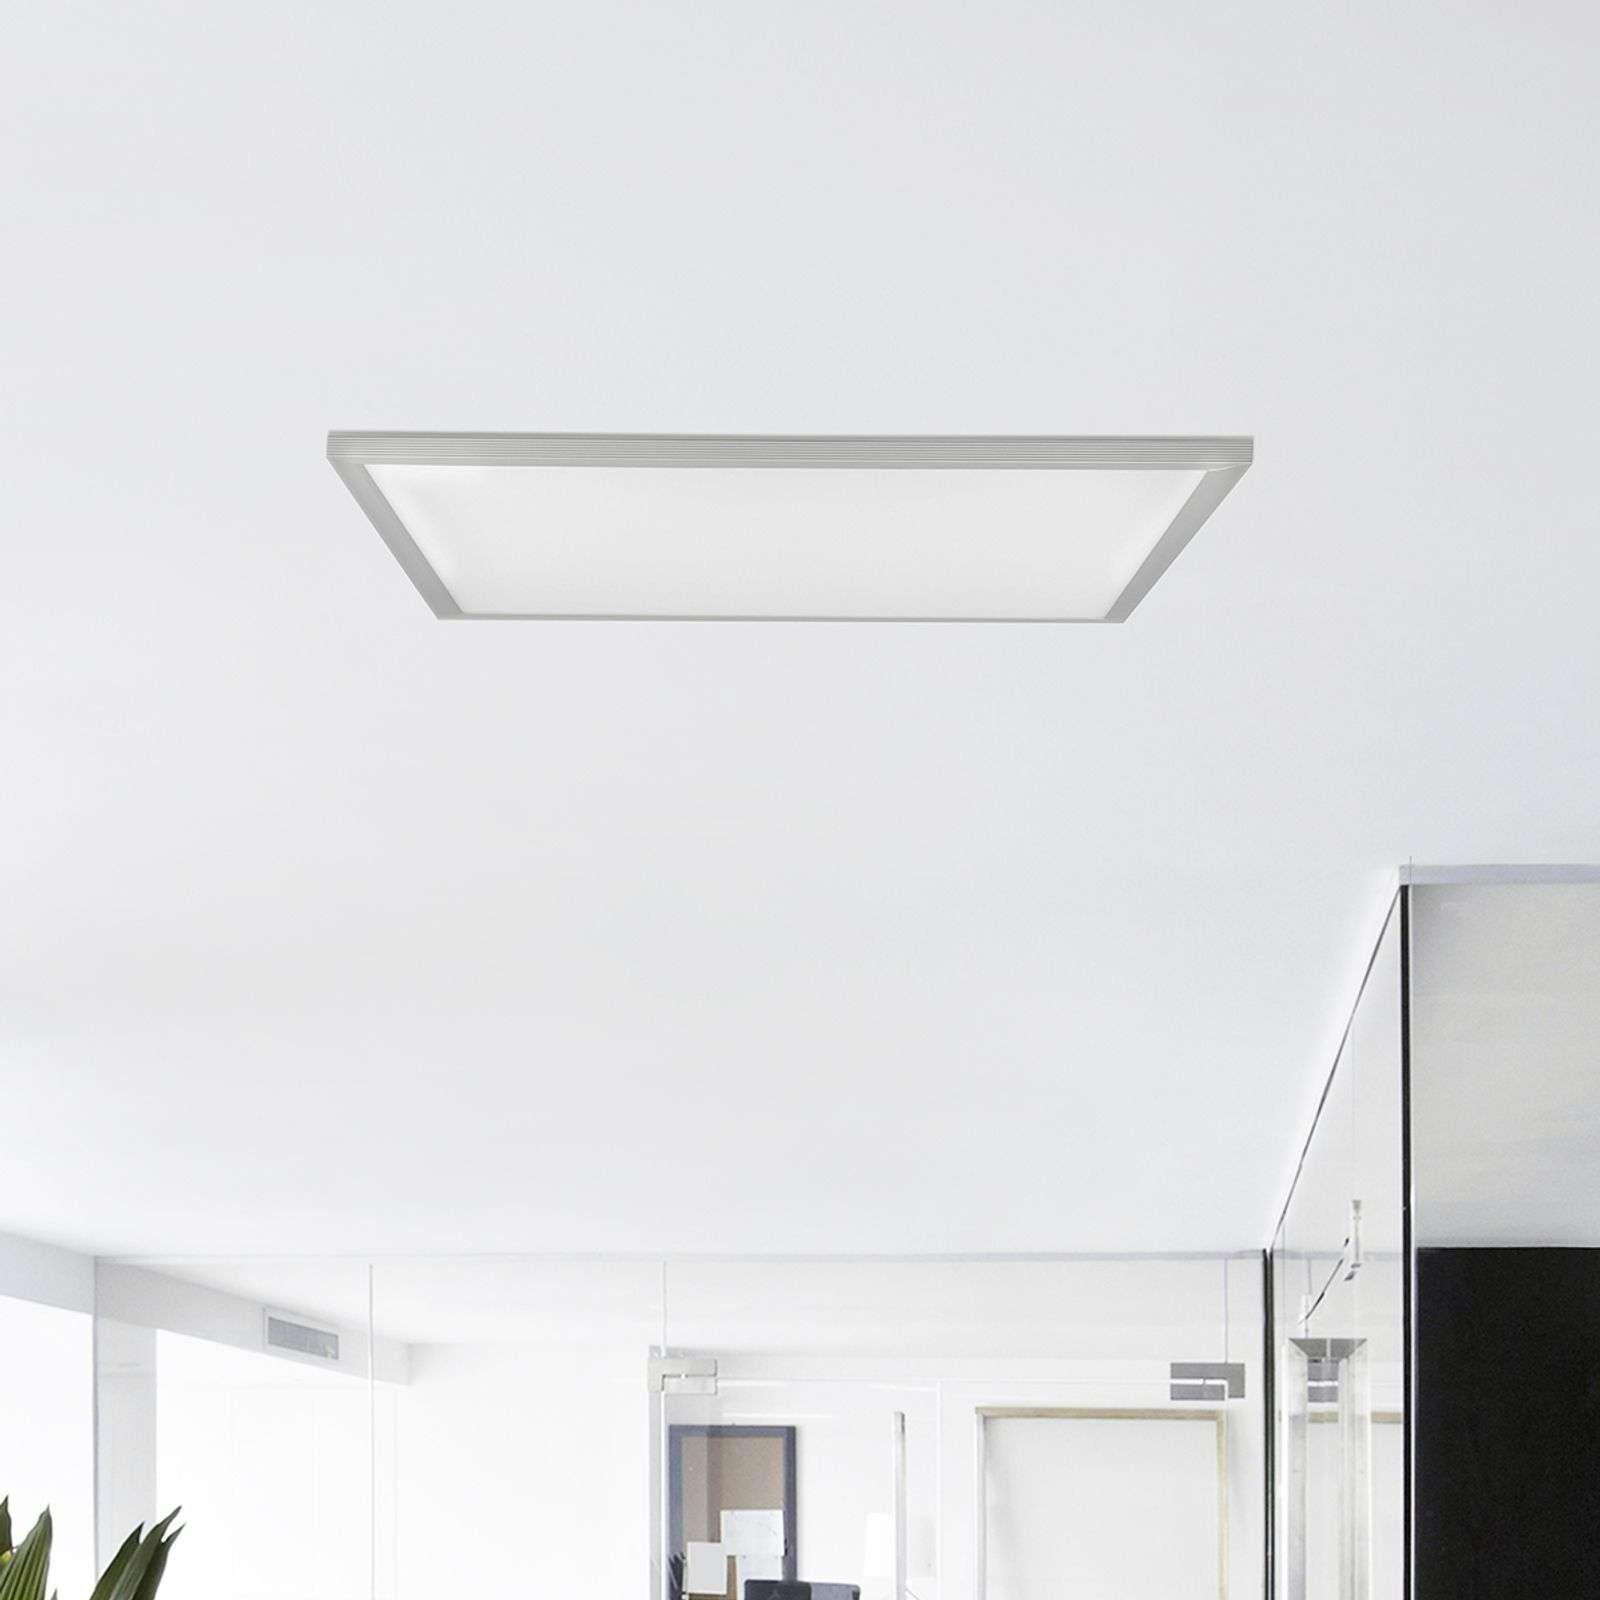 Full Size of Osram Planon Plus Light Led Panel 300x600mm Frameless 600x600mm 600x600 Pure 1200x300 Paneli 600 X 1200x300mm Surface Mount Kit Ledvance 40w List 32w (1200 Wohnzimmer Osram Led Panel